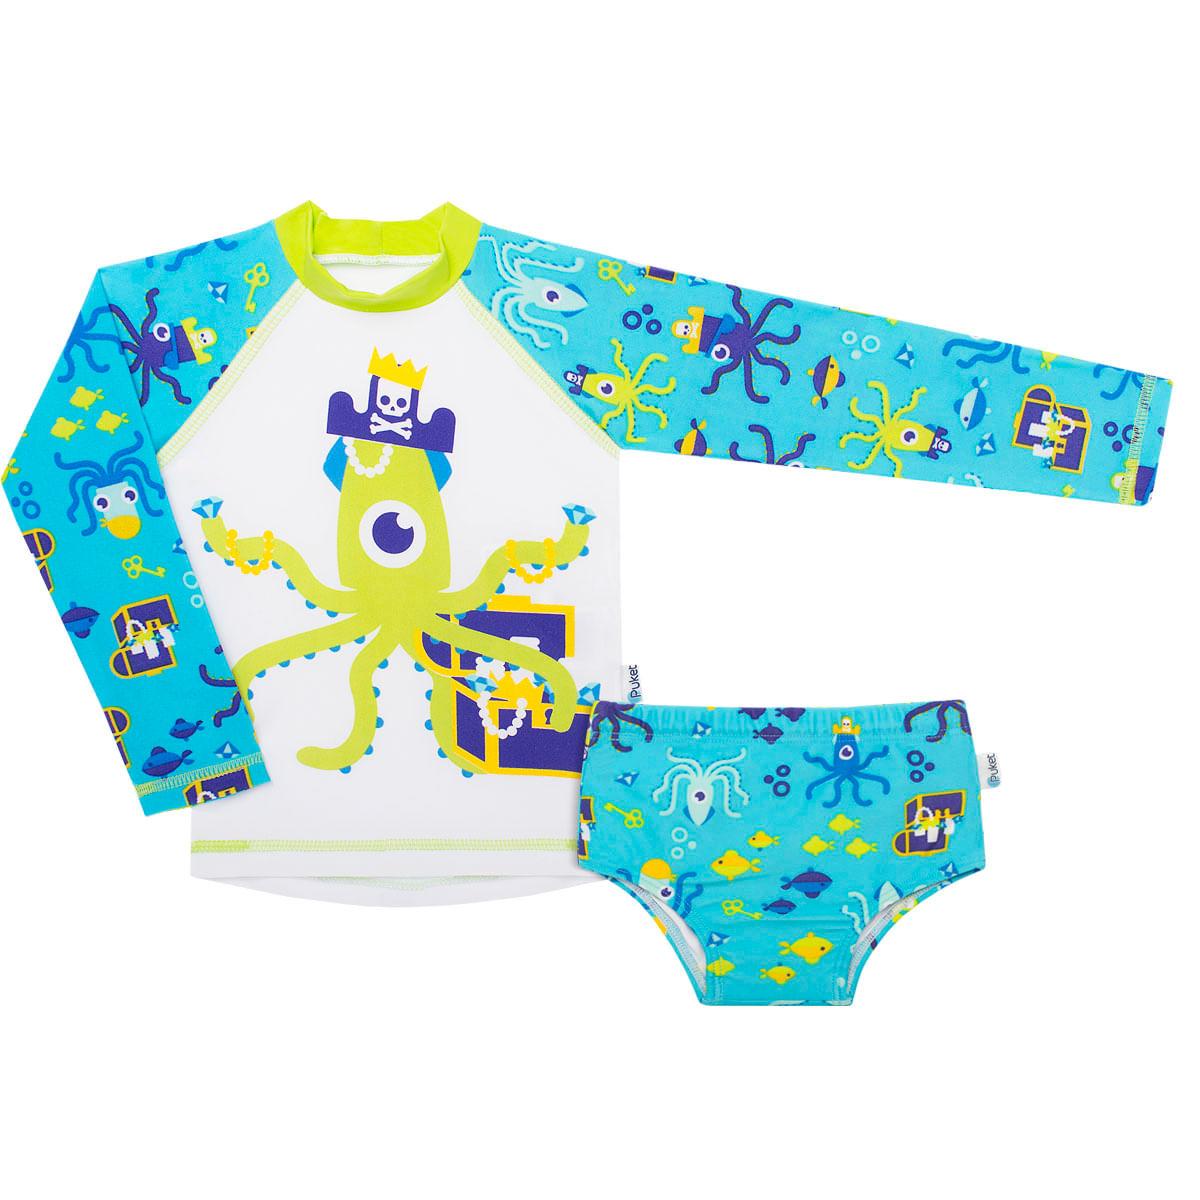 47b465603 Conjunto de banho infantil Polvo Pirata: Camiseta Surfista + Sunga - Puket